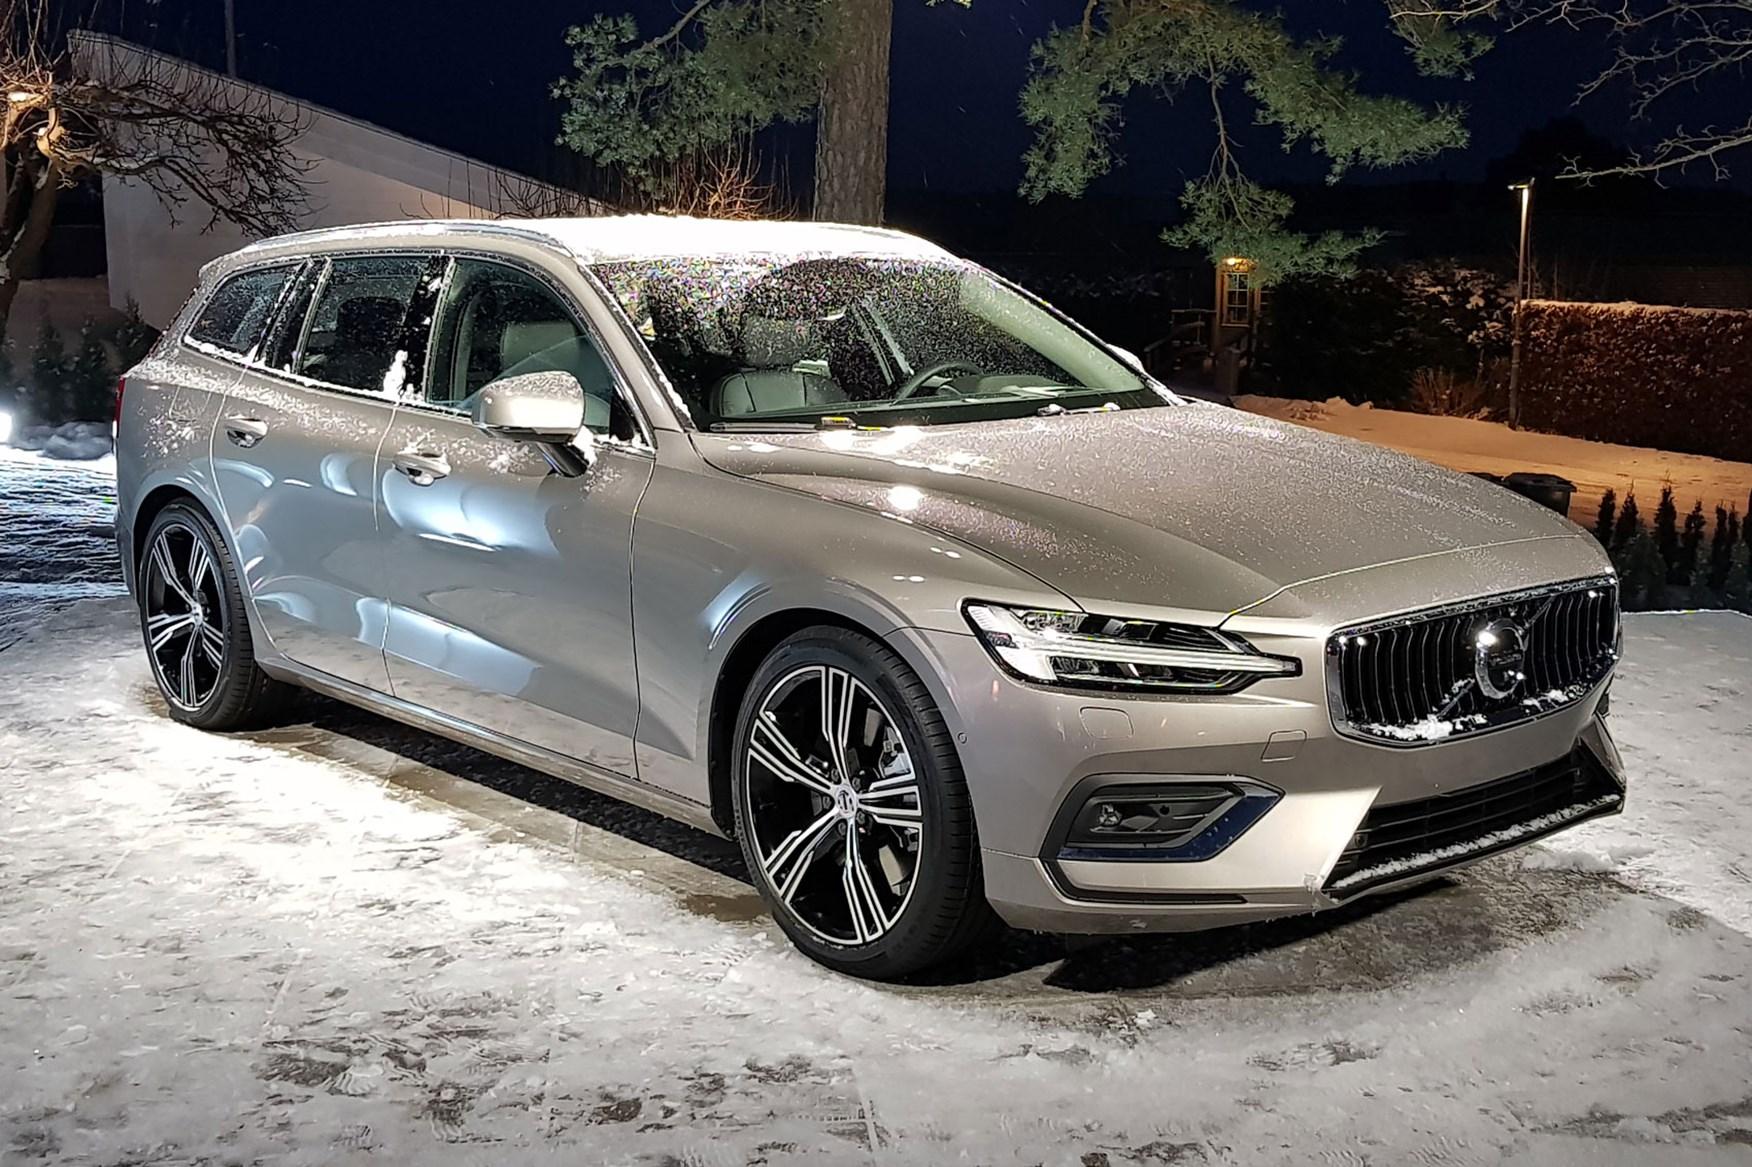 2018 Volvo S60 Release Date >> Volvo V60 estate (2018): interior, UK price and release date | CAR Magazine